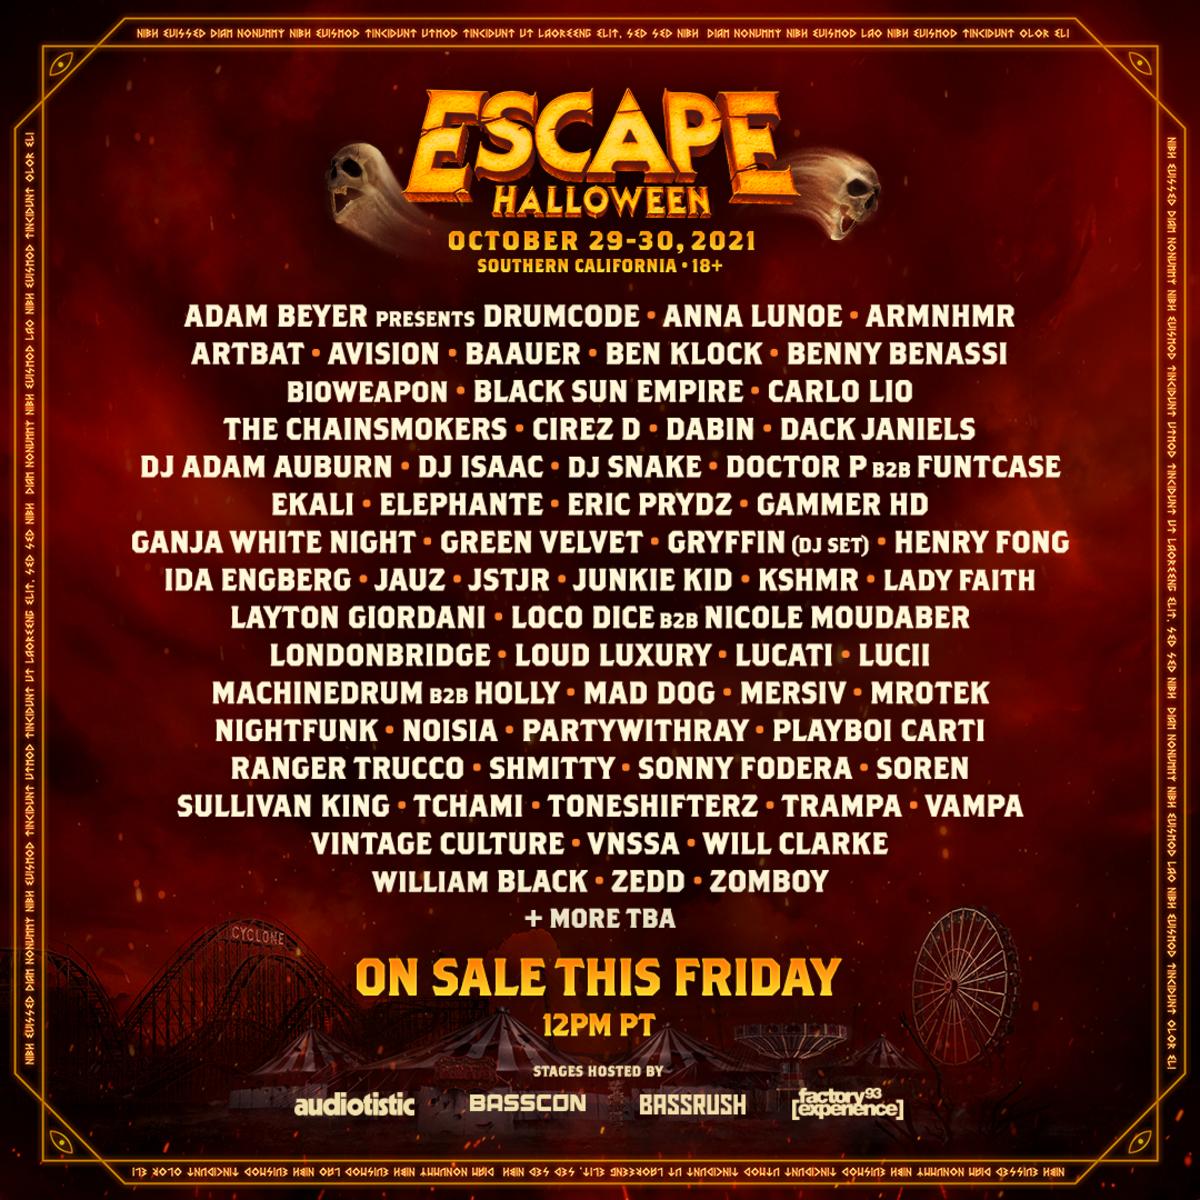 Escape Halloween 2021 lineup.